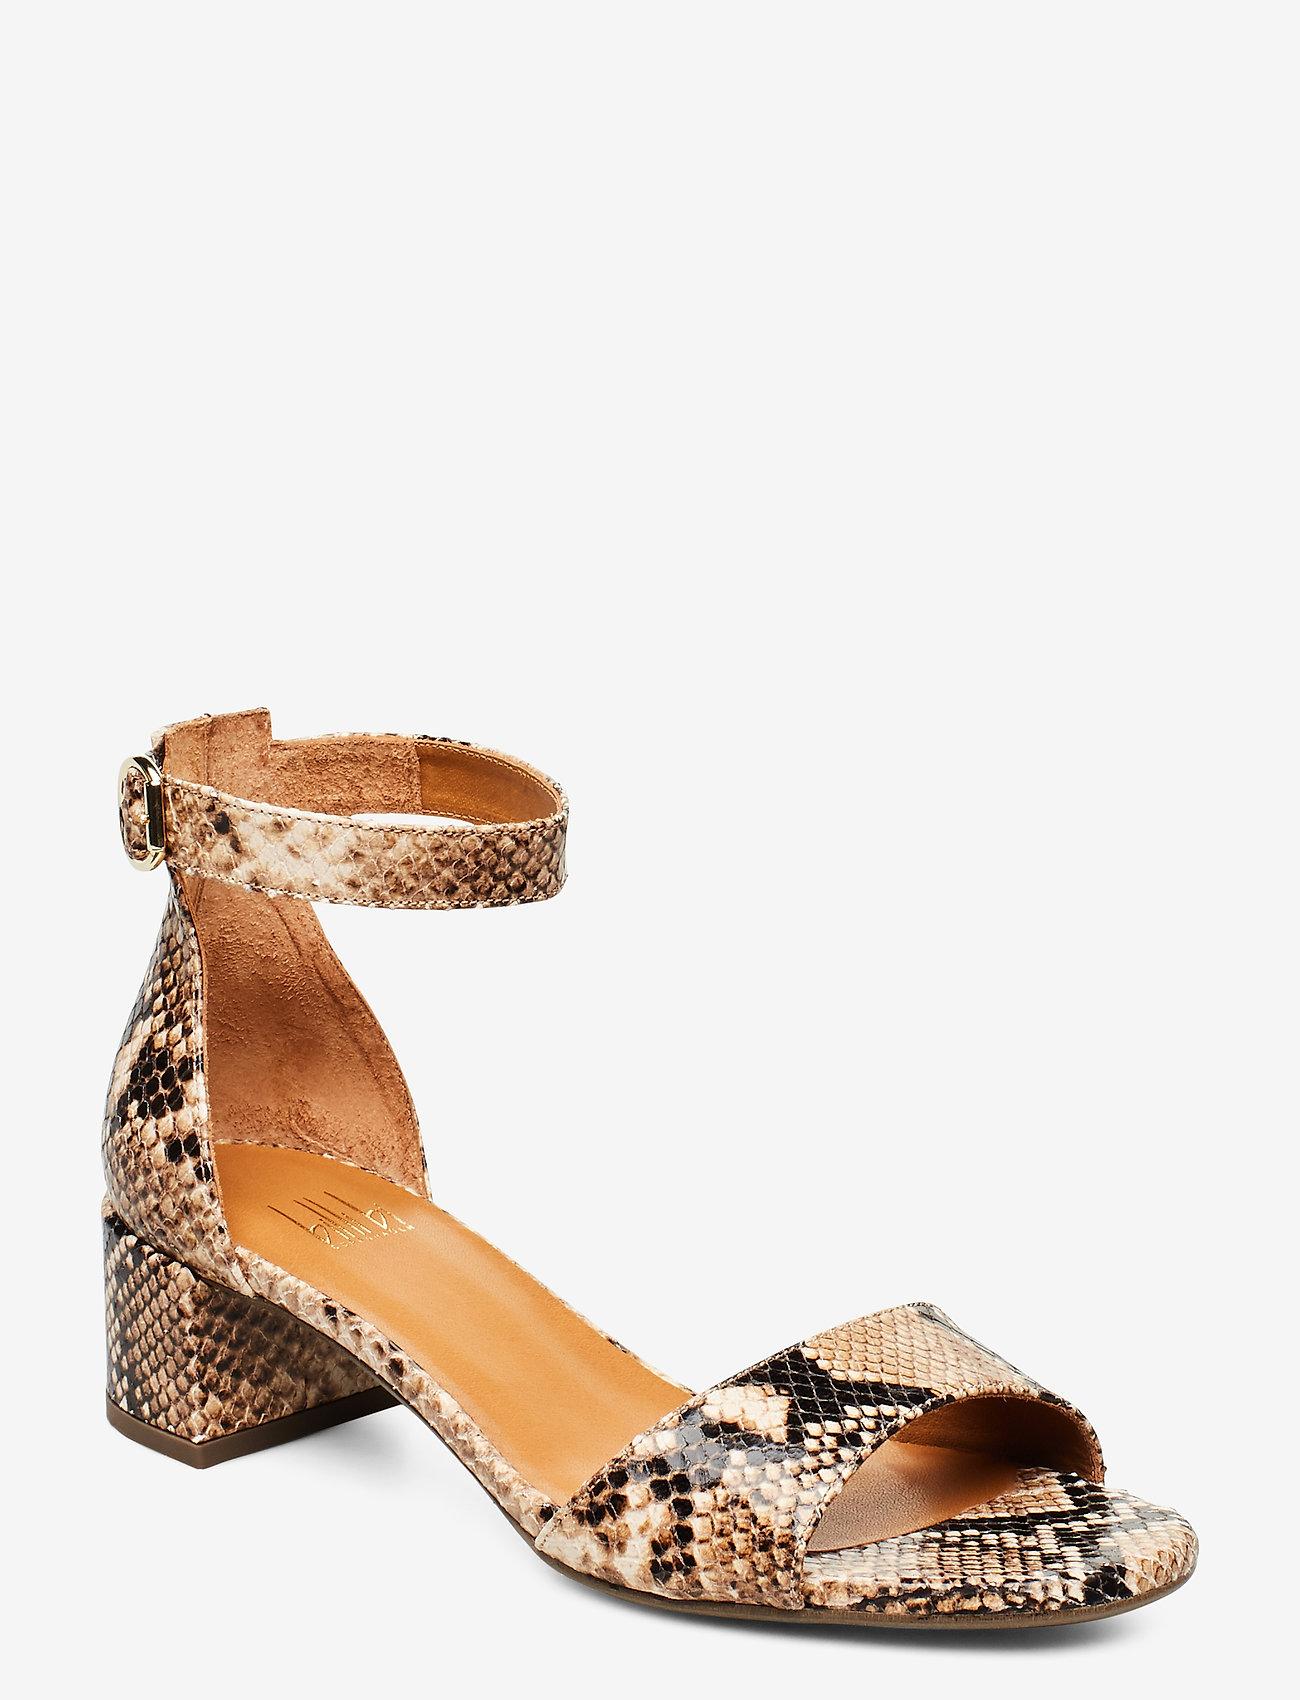 Billi Bi - Sandals 4607 - høyhælte sandaler - beige 6071 snake 34 p - 0